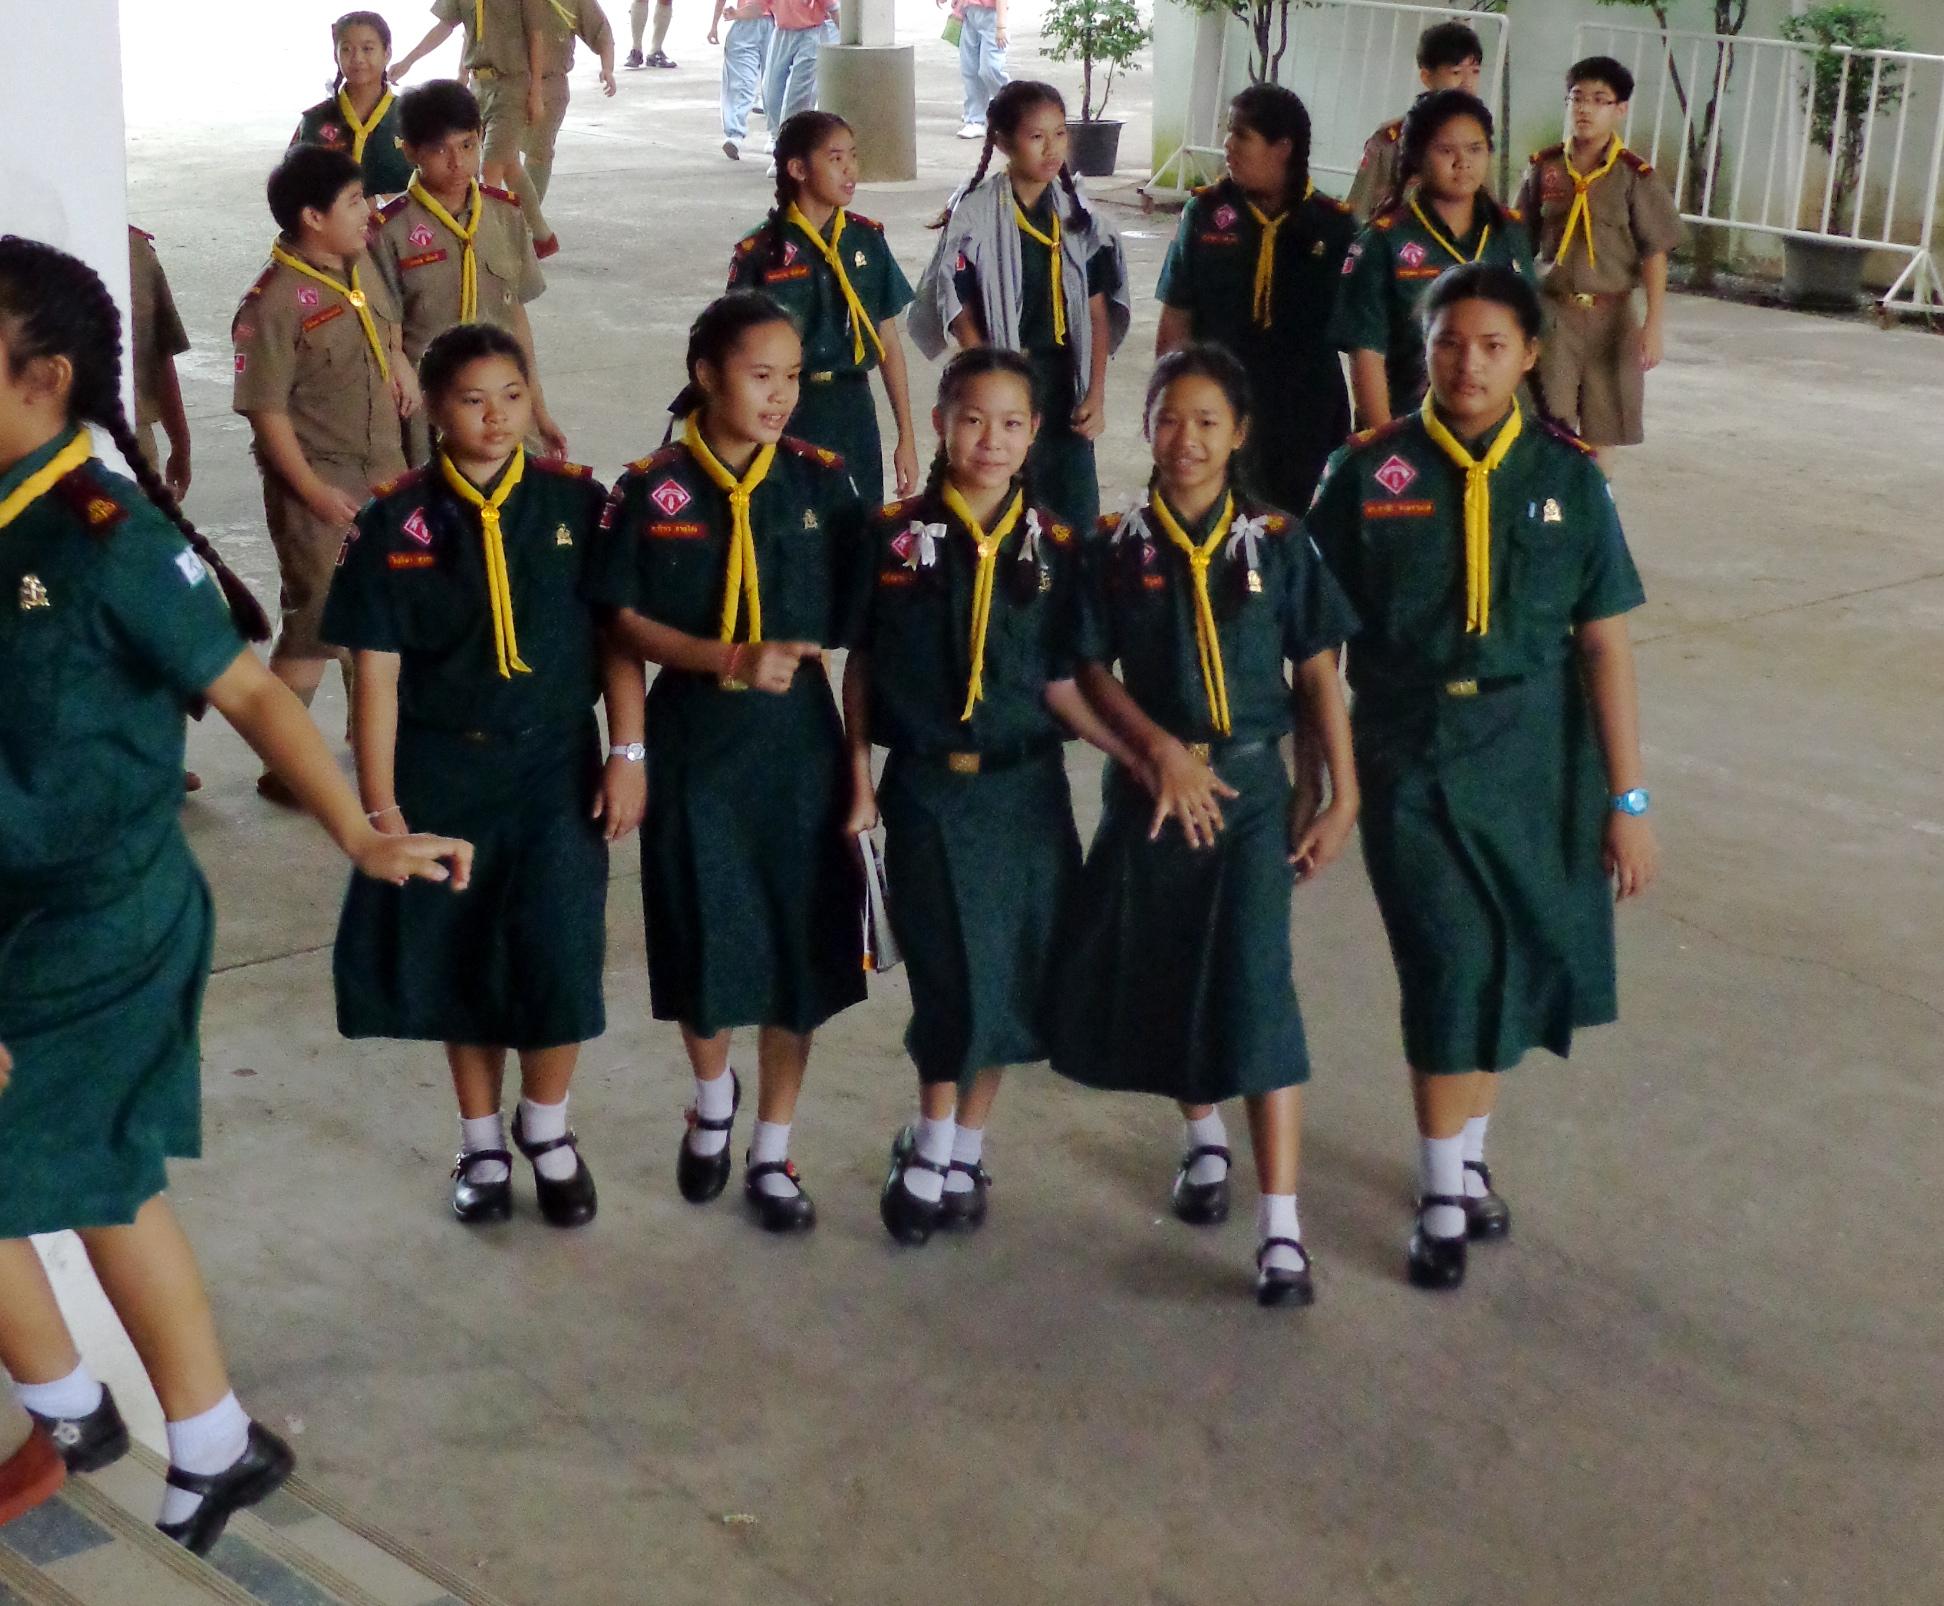 On Fridays We Wear Boy Scout Uniforms | Mishvo in Motion